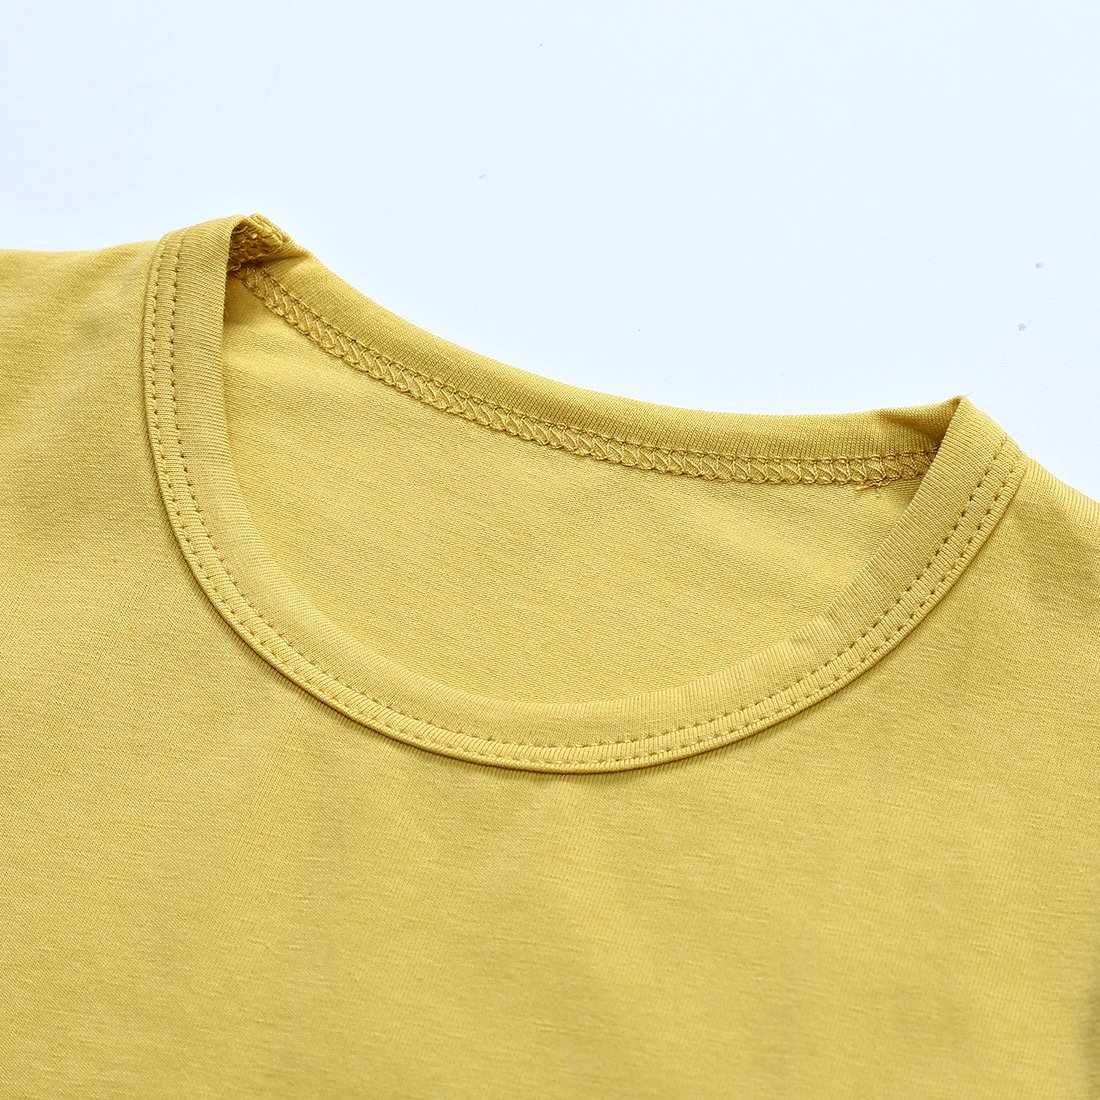 b3e5044e557f Amazon.com  ChicNChic Baby Girls Boys Outfits Car T-Shirt + Black Plaid Shorts  Summer 2pcs Set Clothes  Clothing